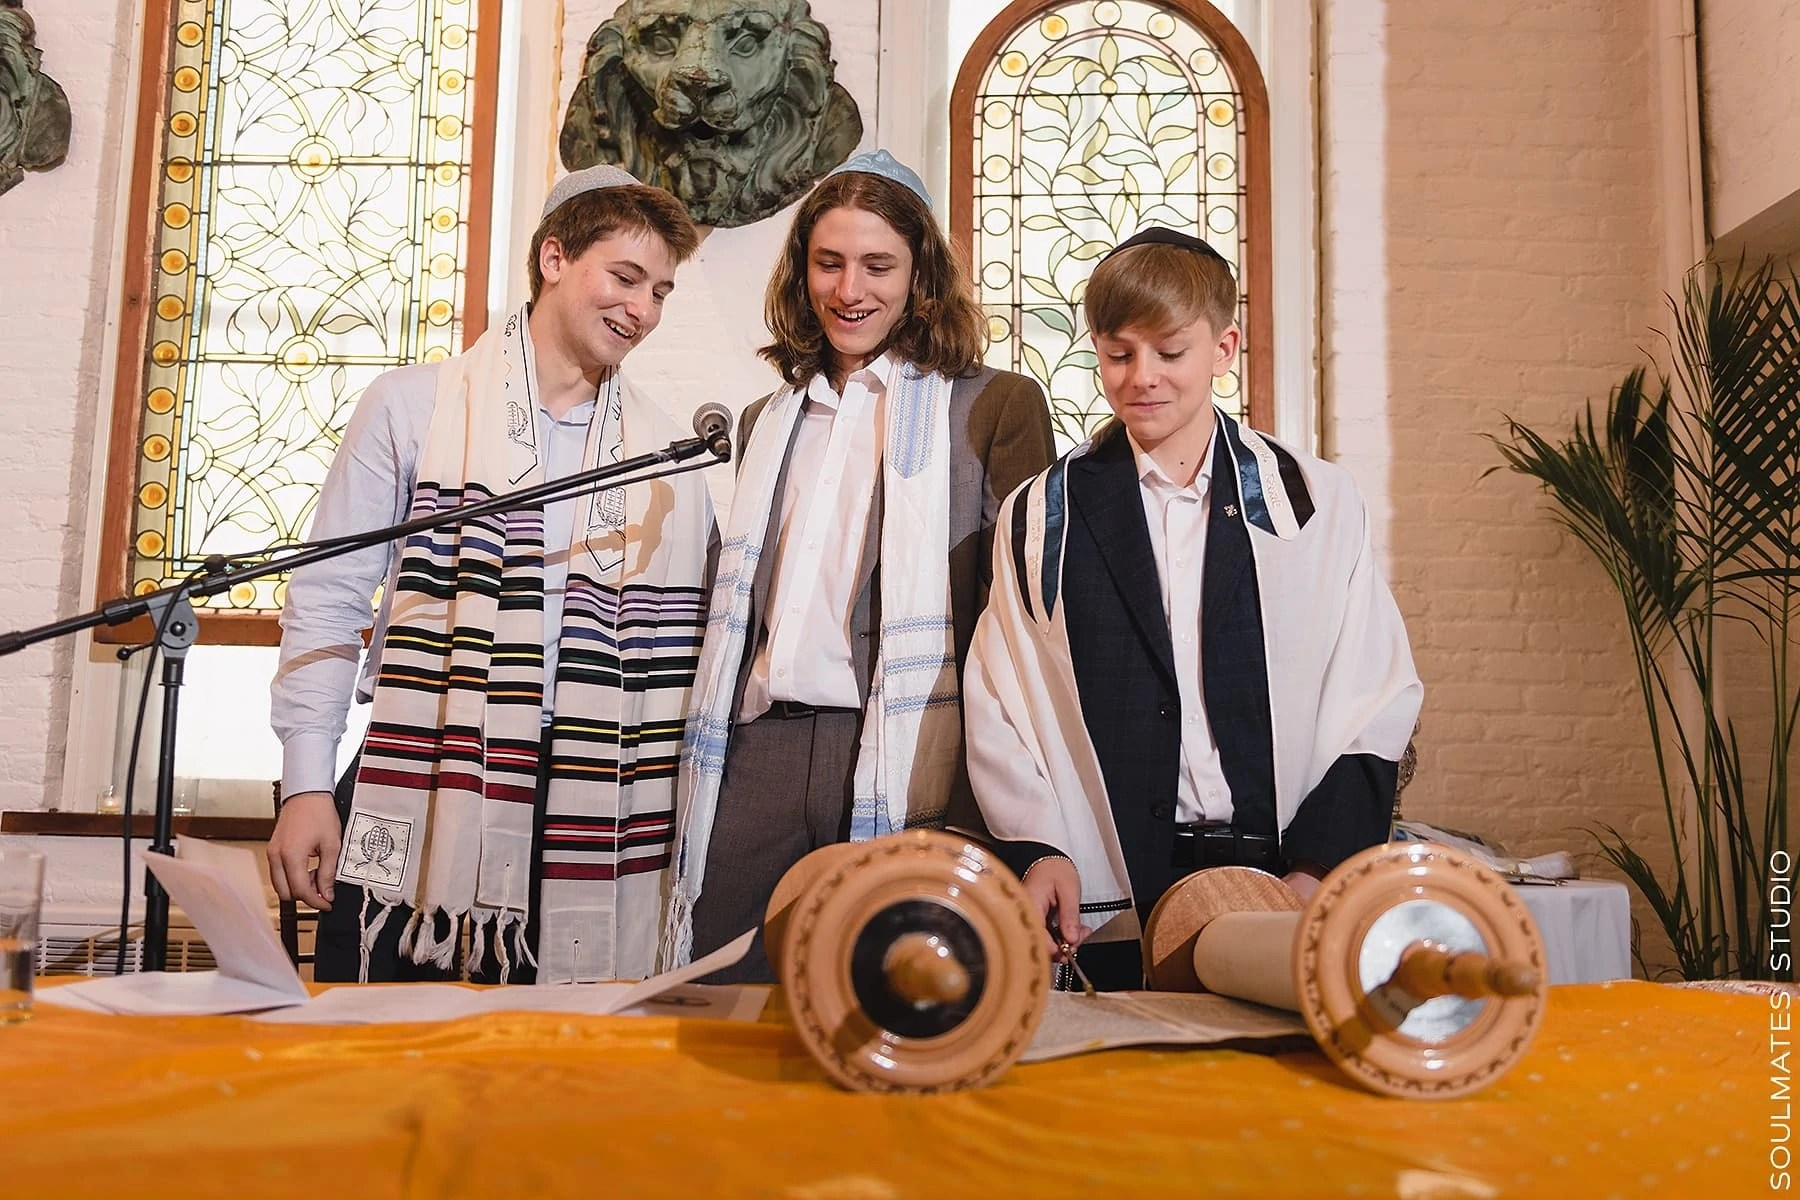 New York Bar mitzvah ceremony